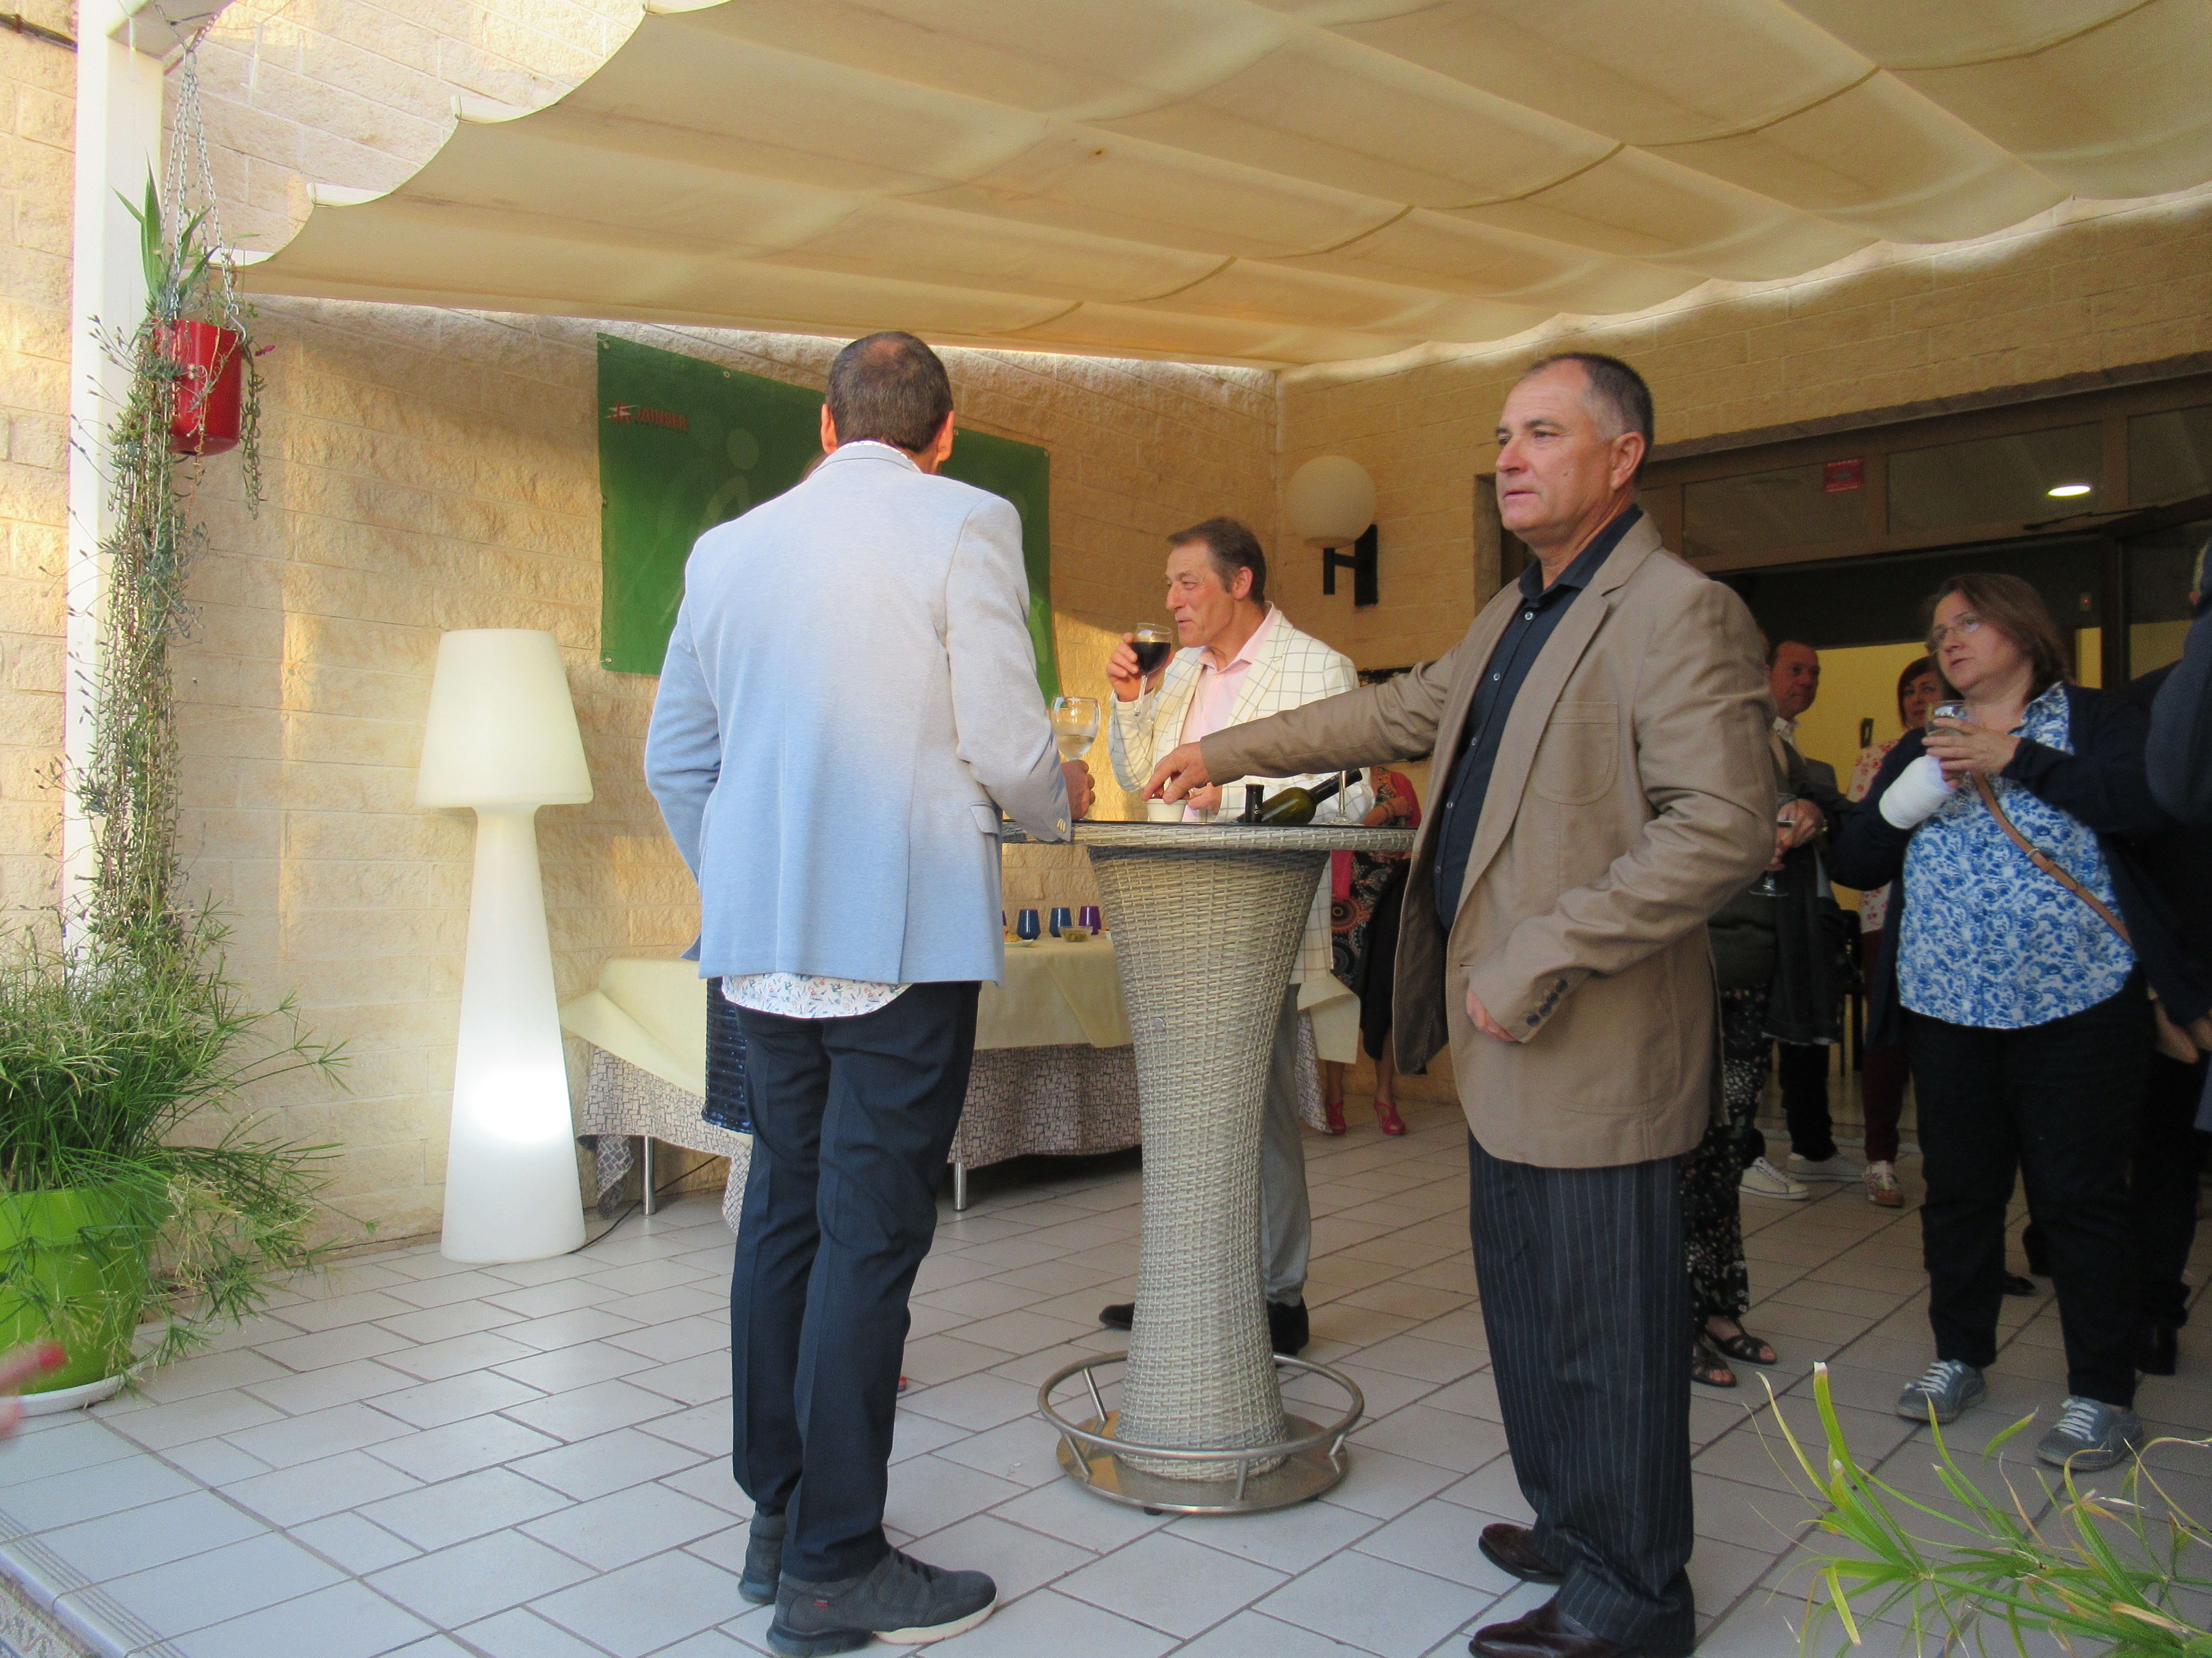 Coctel previo a la cena del club costa blanca marcha nordica